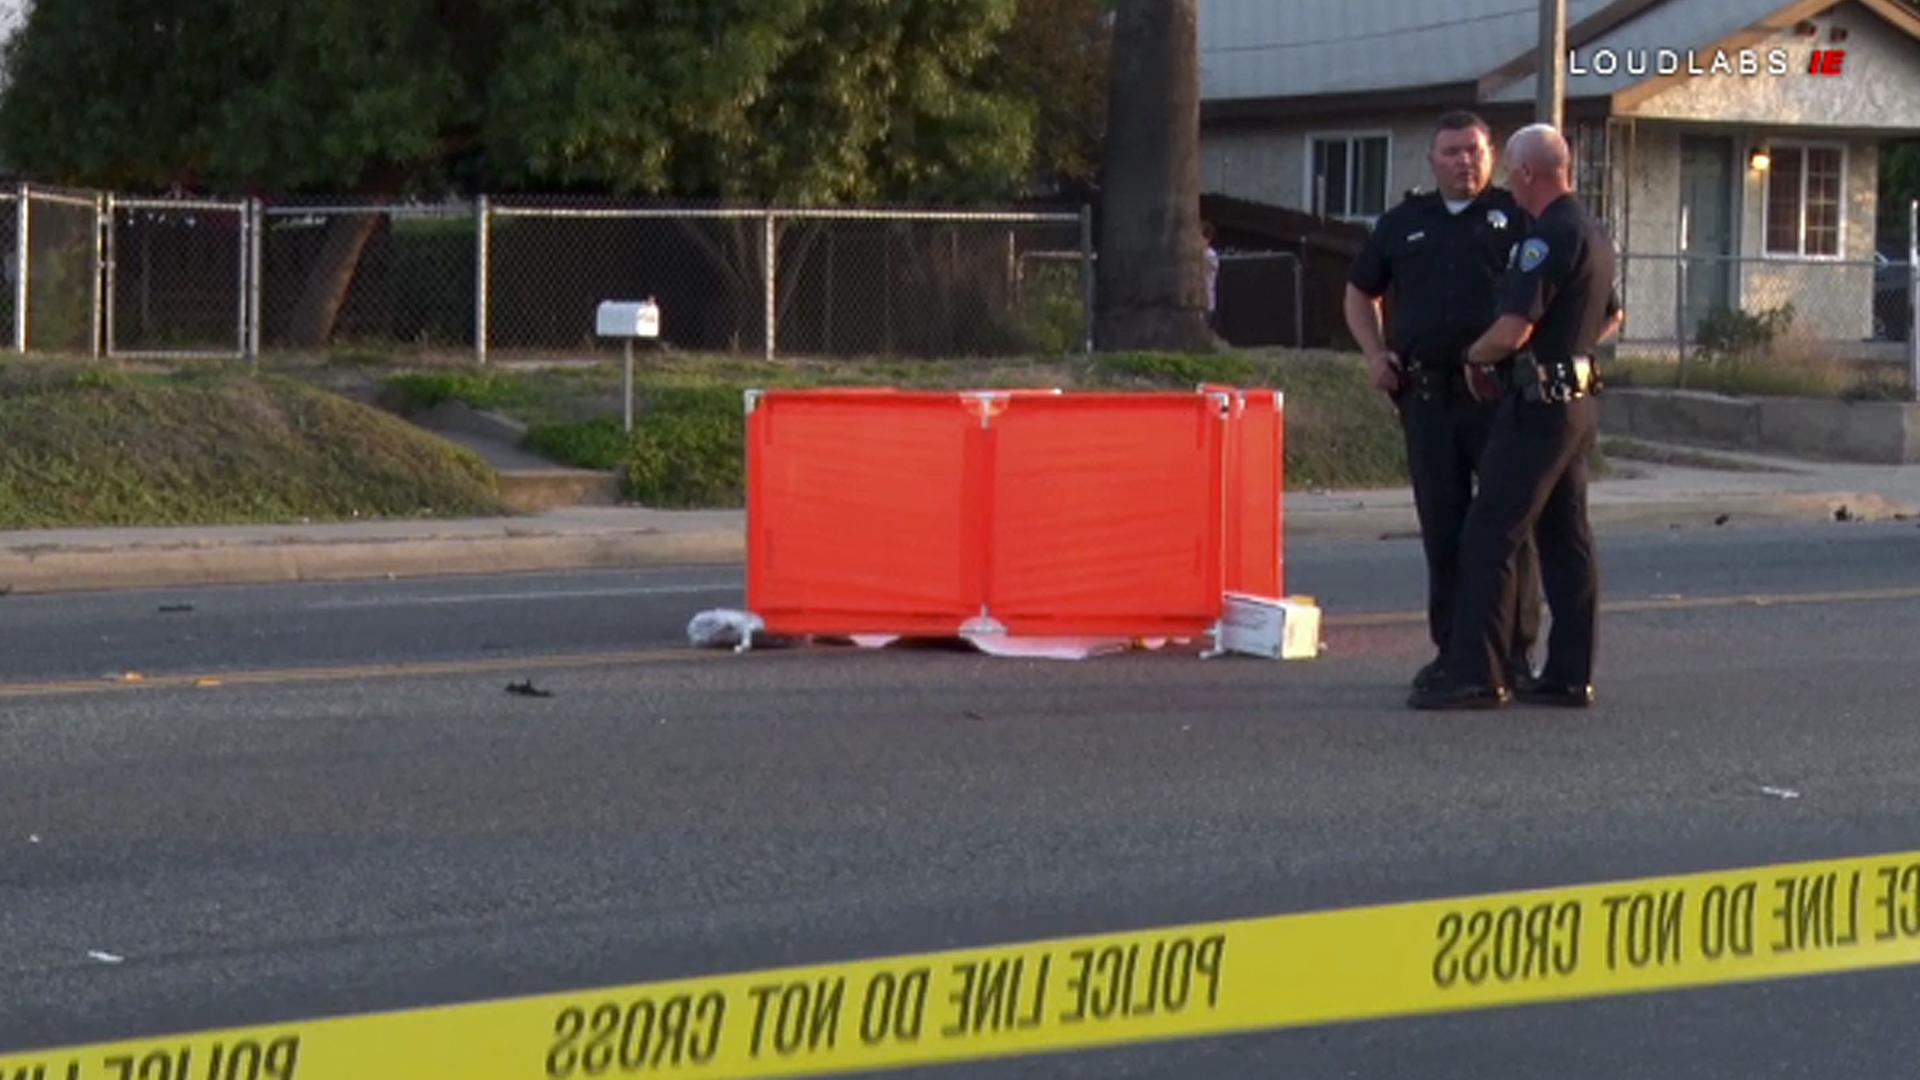 Police investigate a fatal crash in San Bernardino on June 5, 2018. (Credit: Loudlabs)